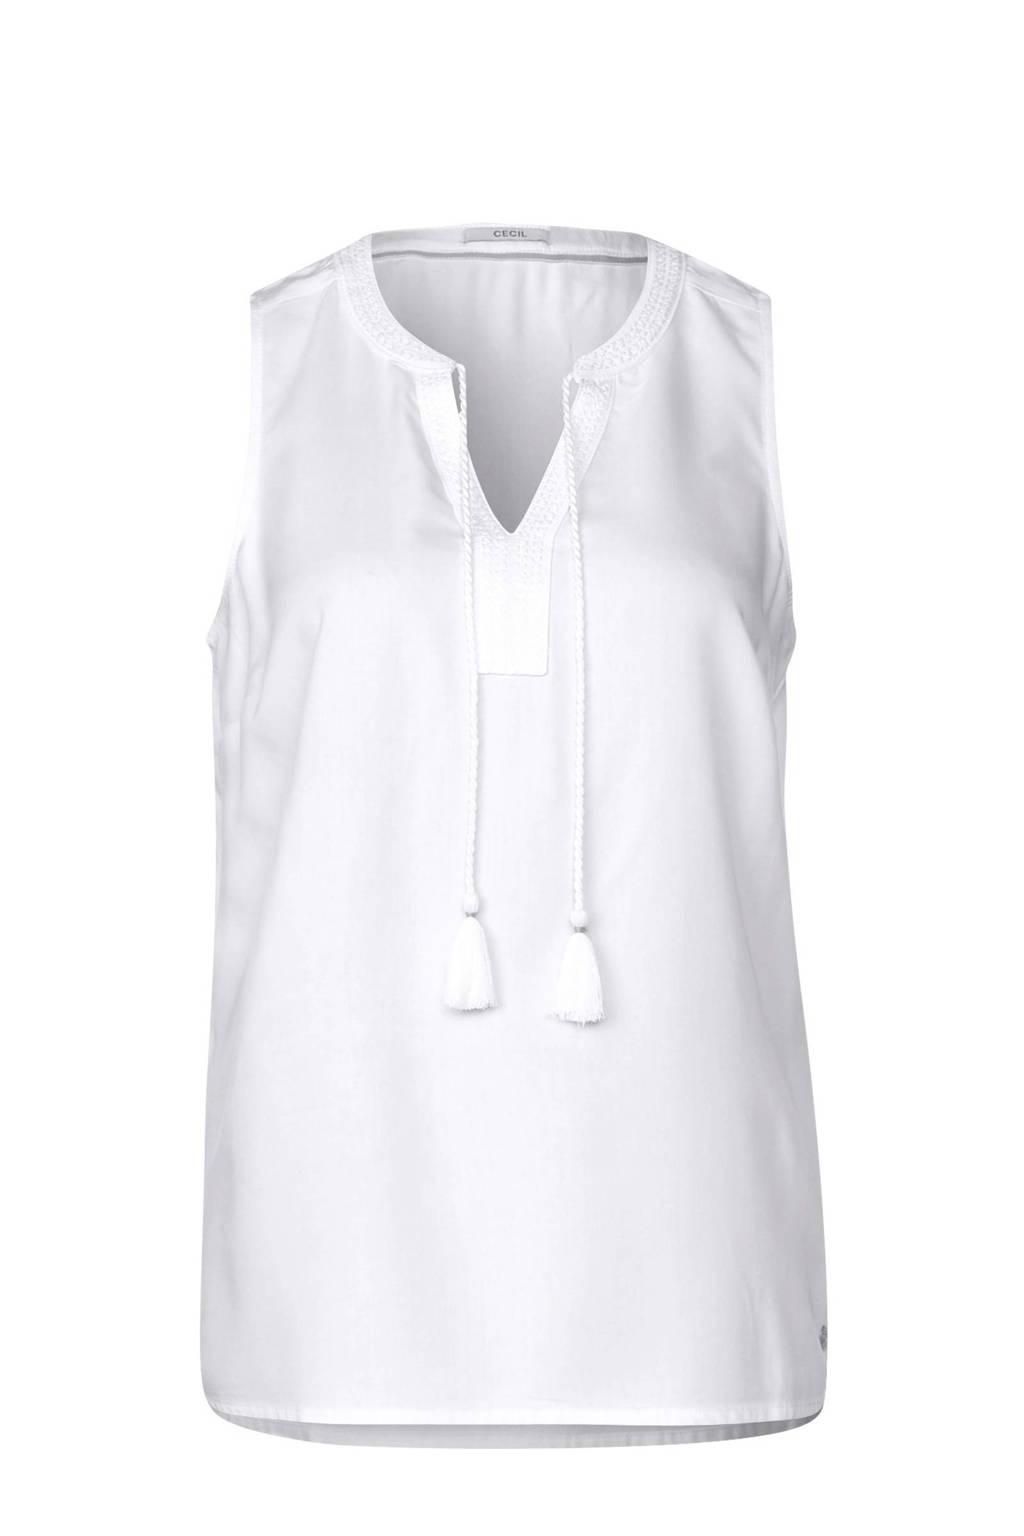 CECIL mouwloze top met franjes wit, Wit